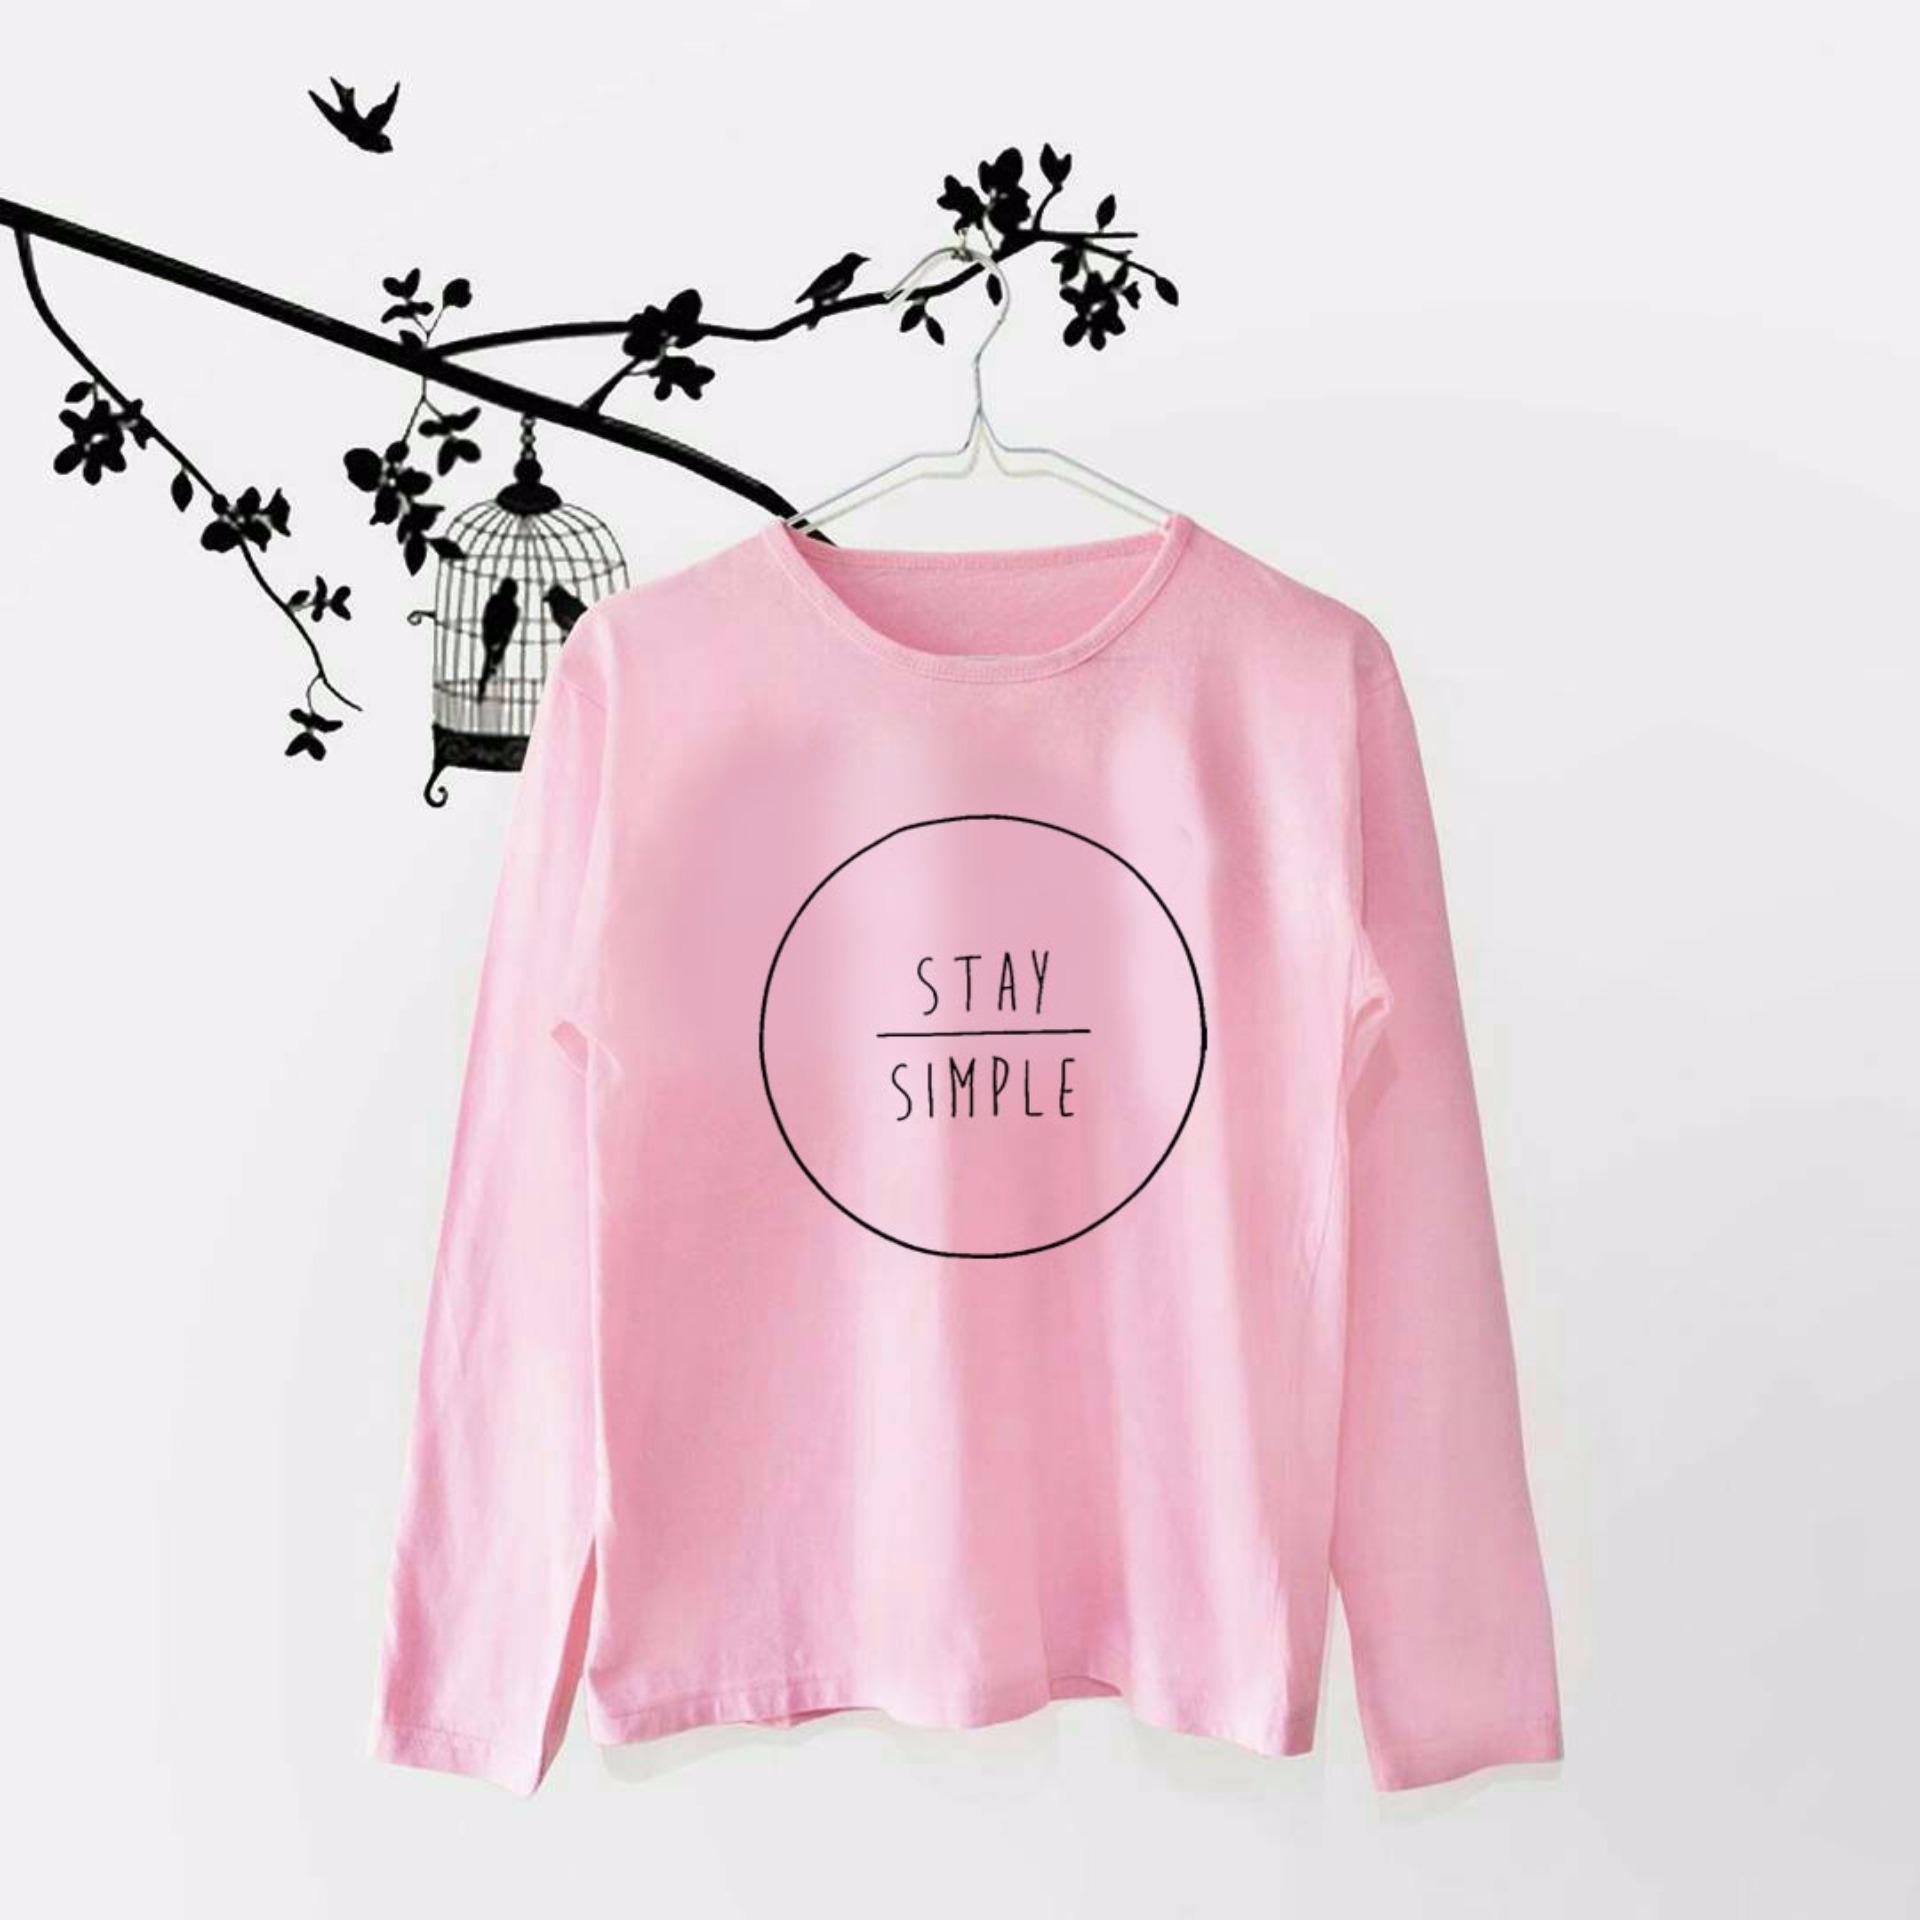 Shopping Comparison Tumblr Tee / T-Shirt / Kaos Wanita Stay Simple - Pink Lengan Panjang